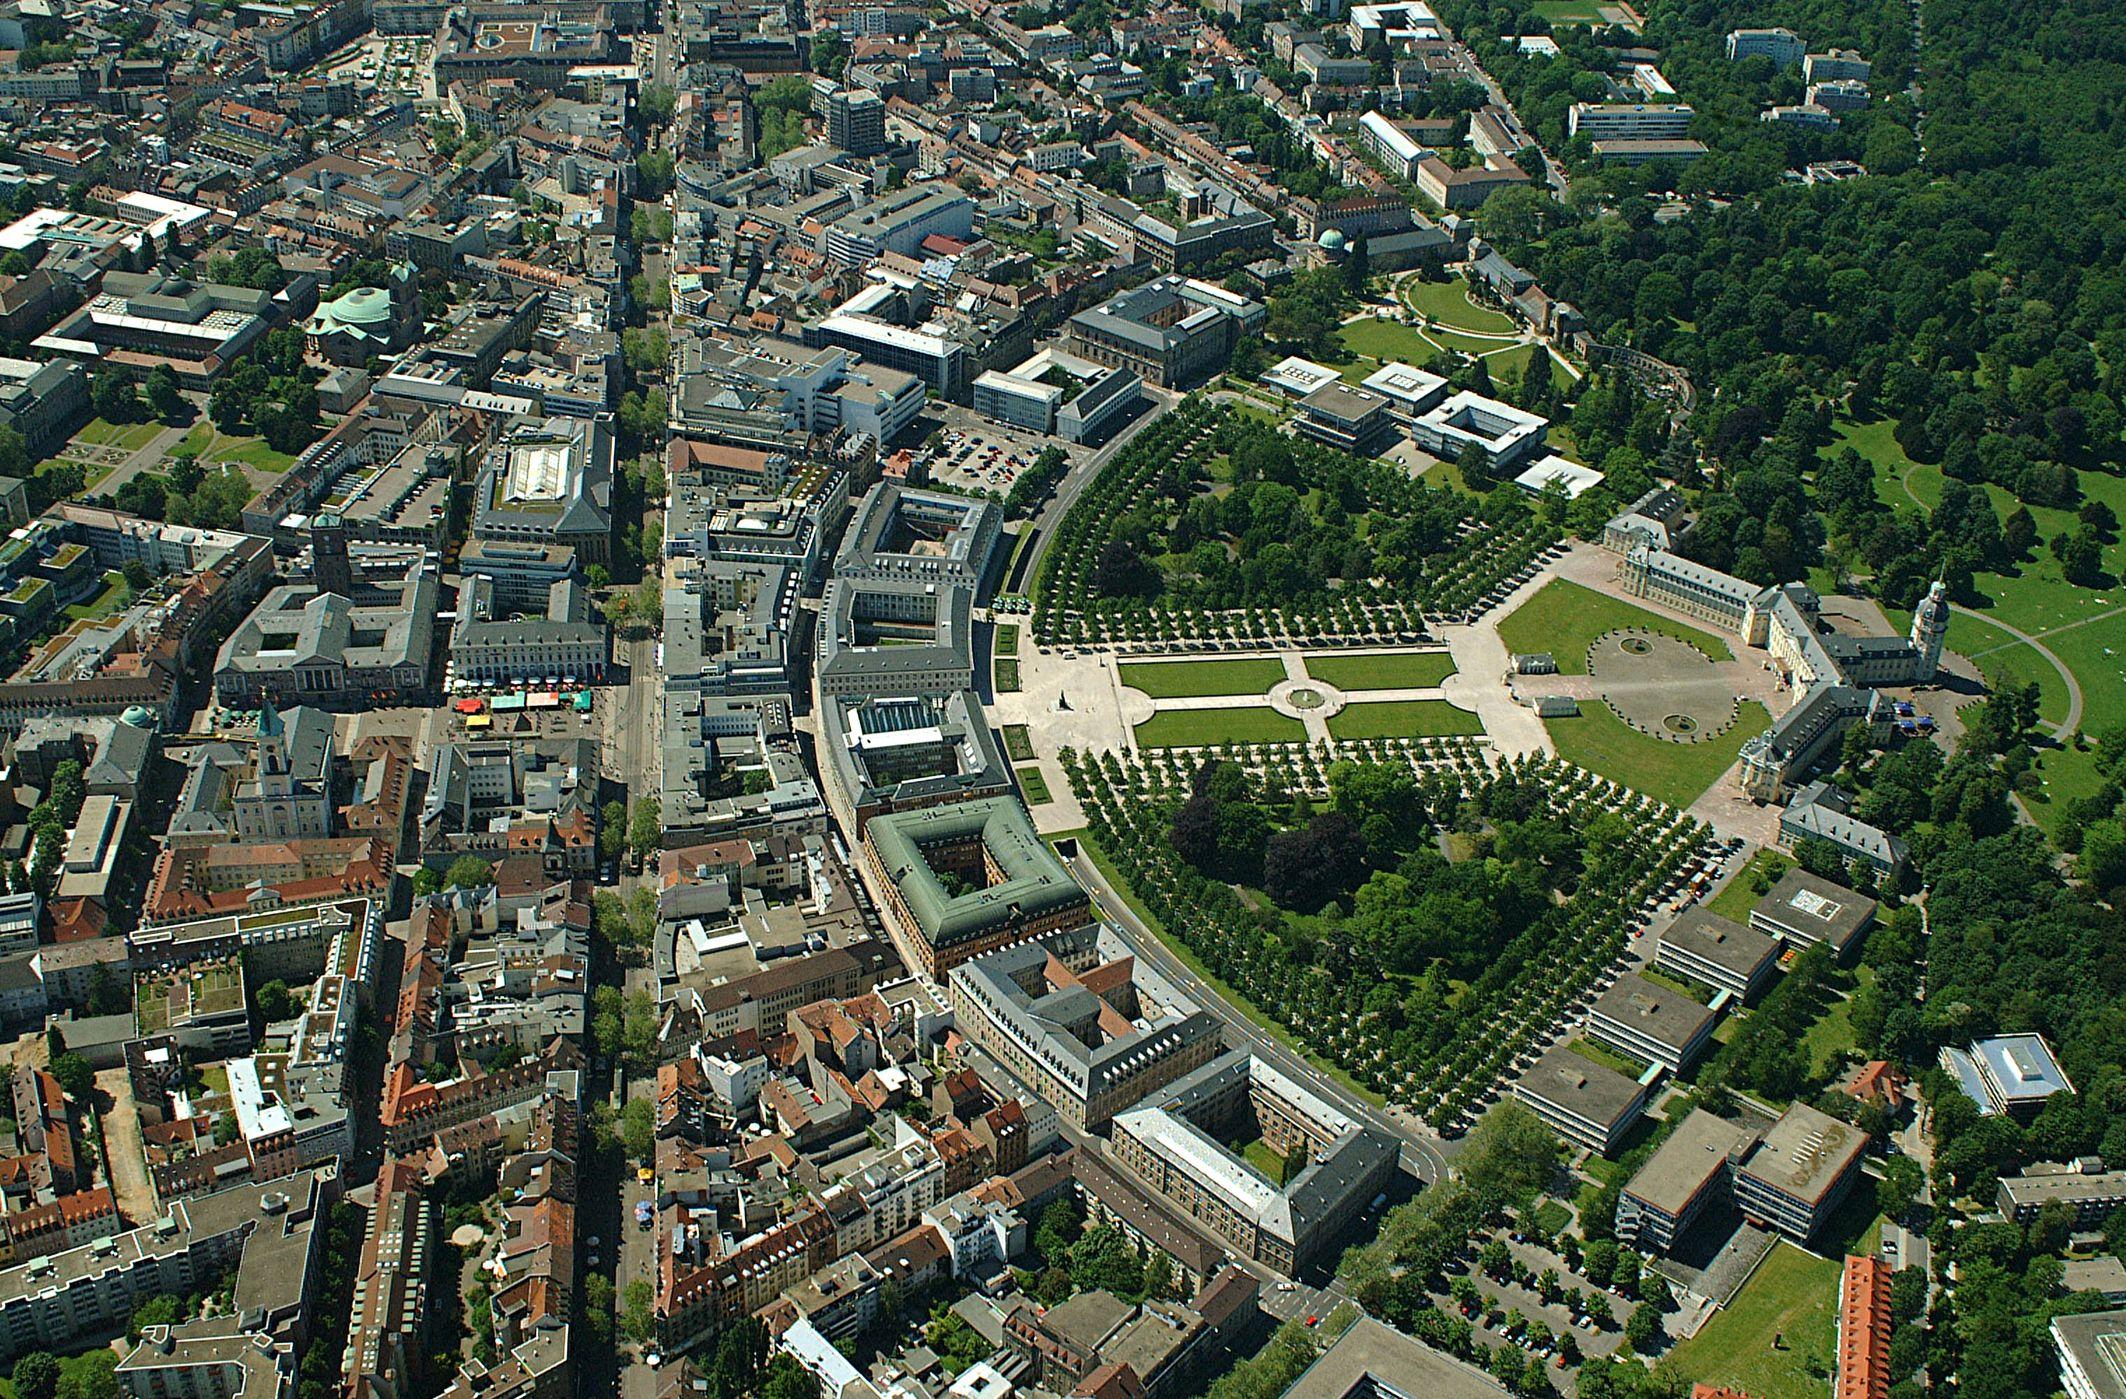 Zoologischer Garten Karlsruhe Neu Karlsruhe